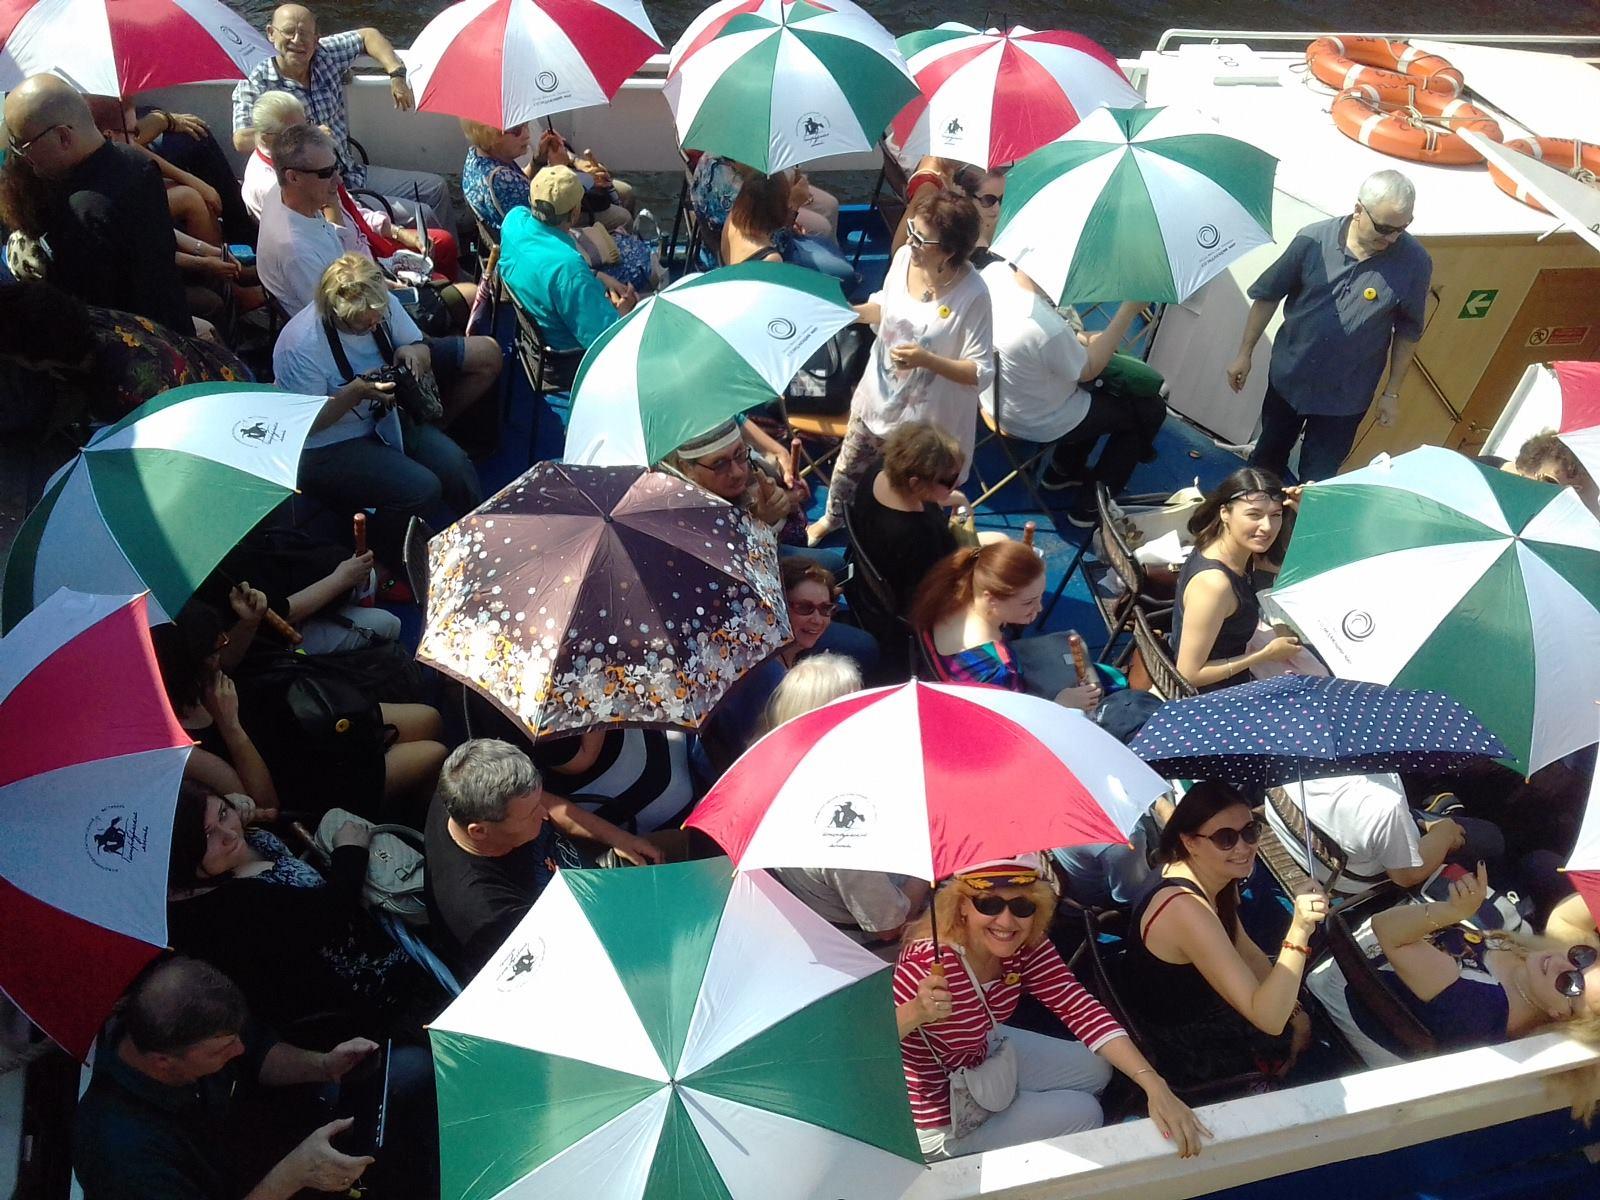 На теплоходе Самсон с фирменными зонтами фестиваля